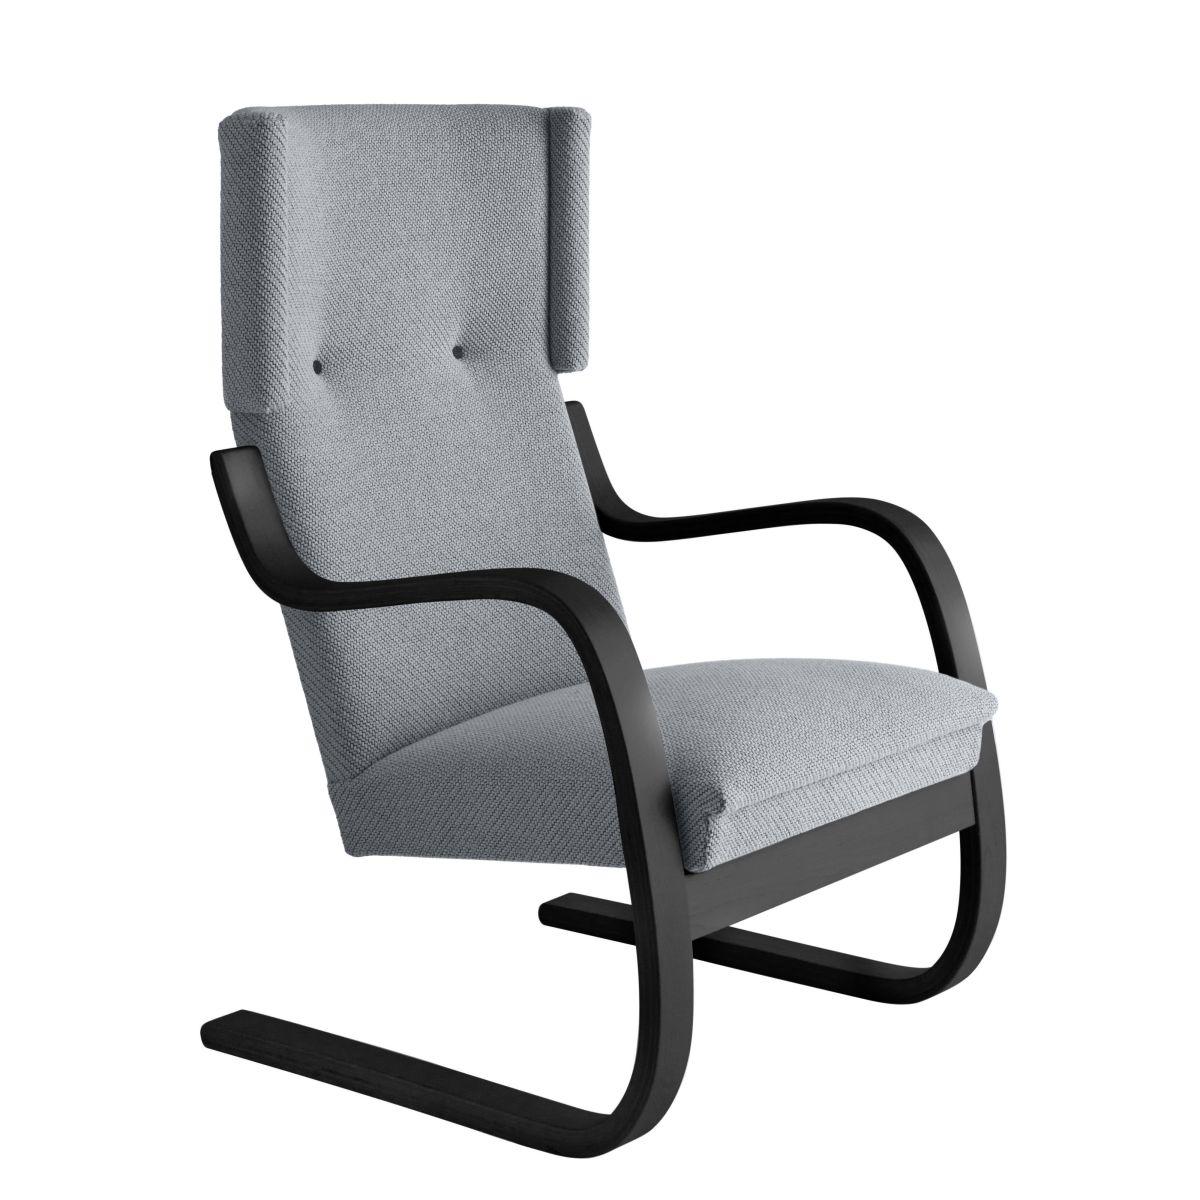 Armchair 401 Birch Black Laquer Sea Fabric Upholstery Artek Grey 2494501